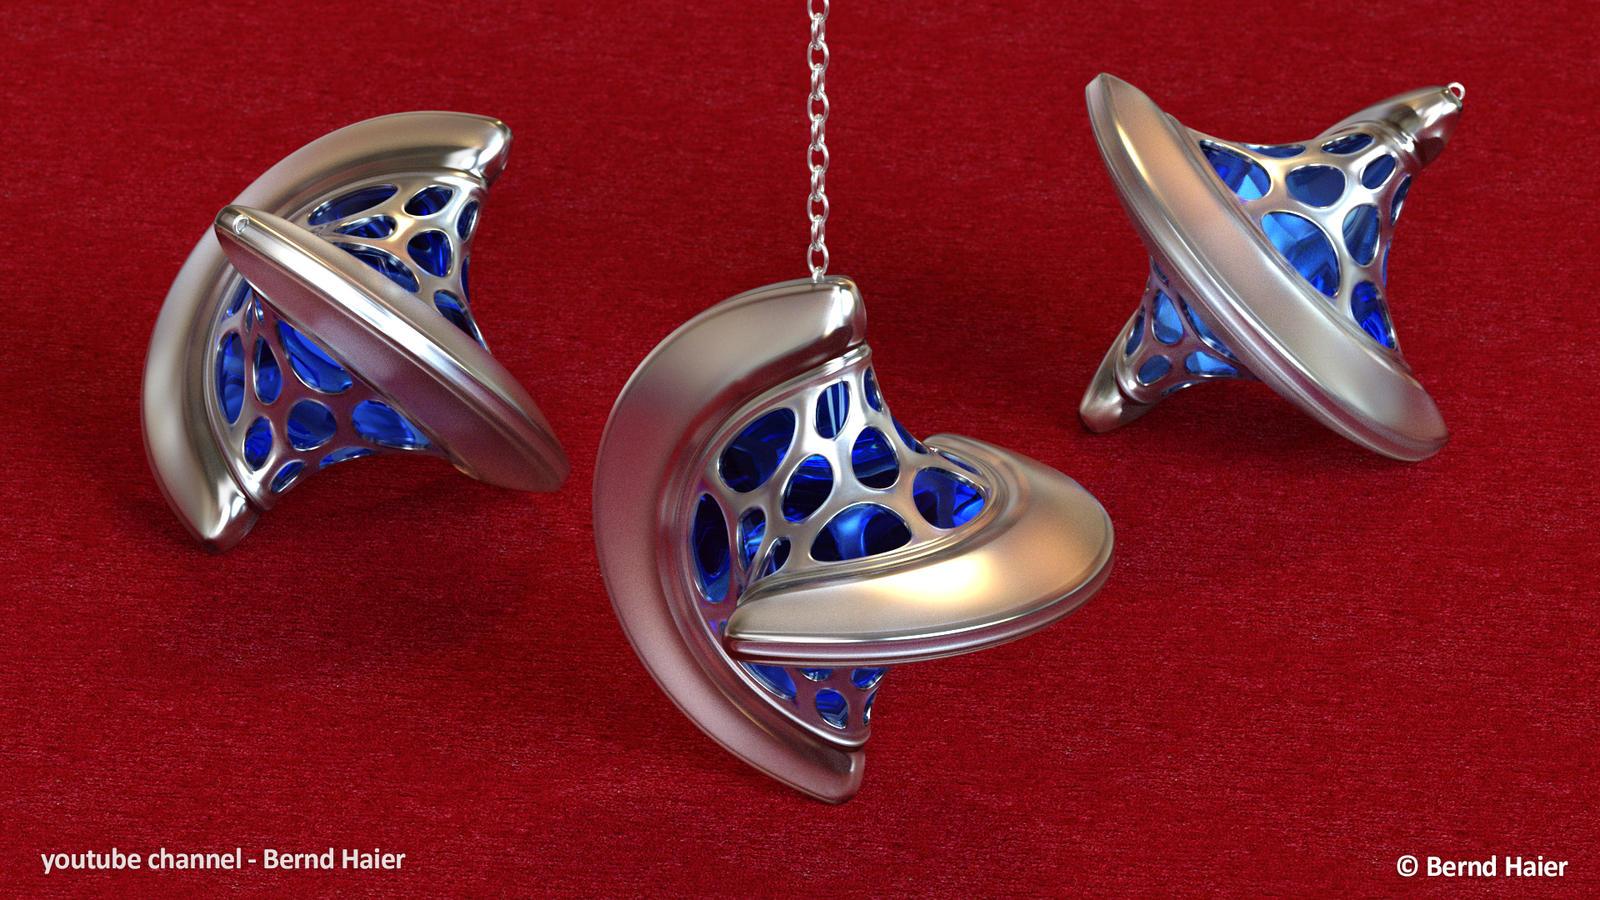 jewelry design part 9 pendant part 2 mat 8 by Bernd-Haier